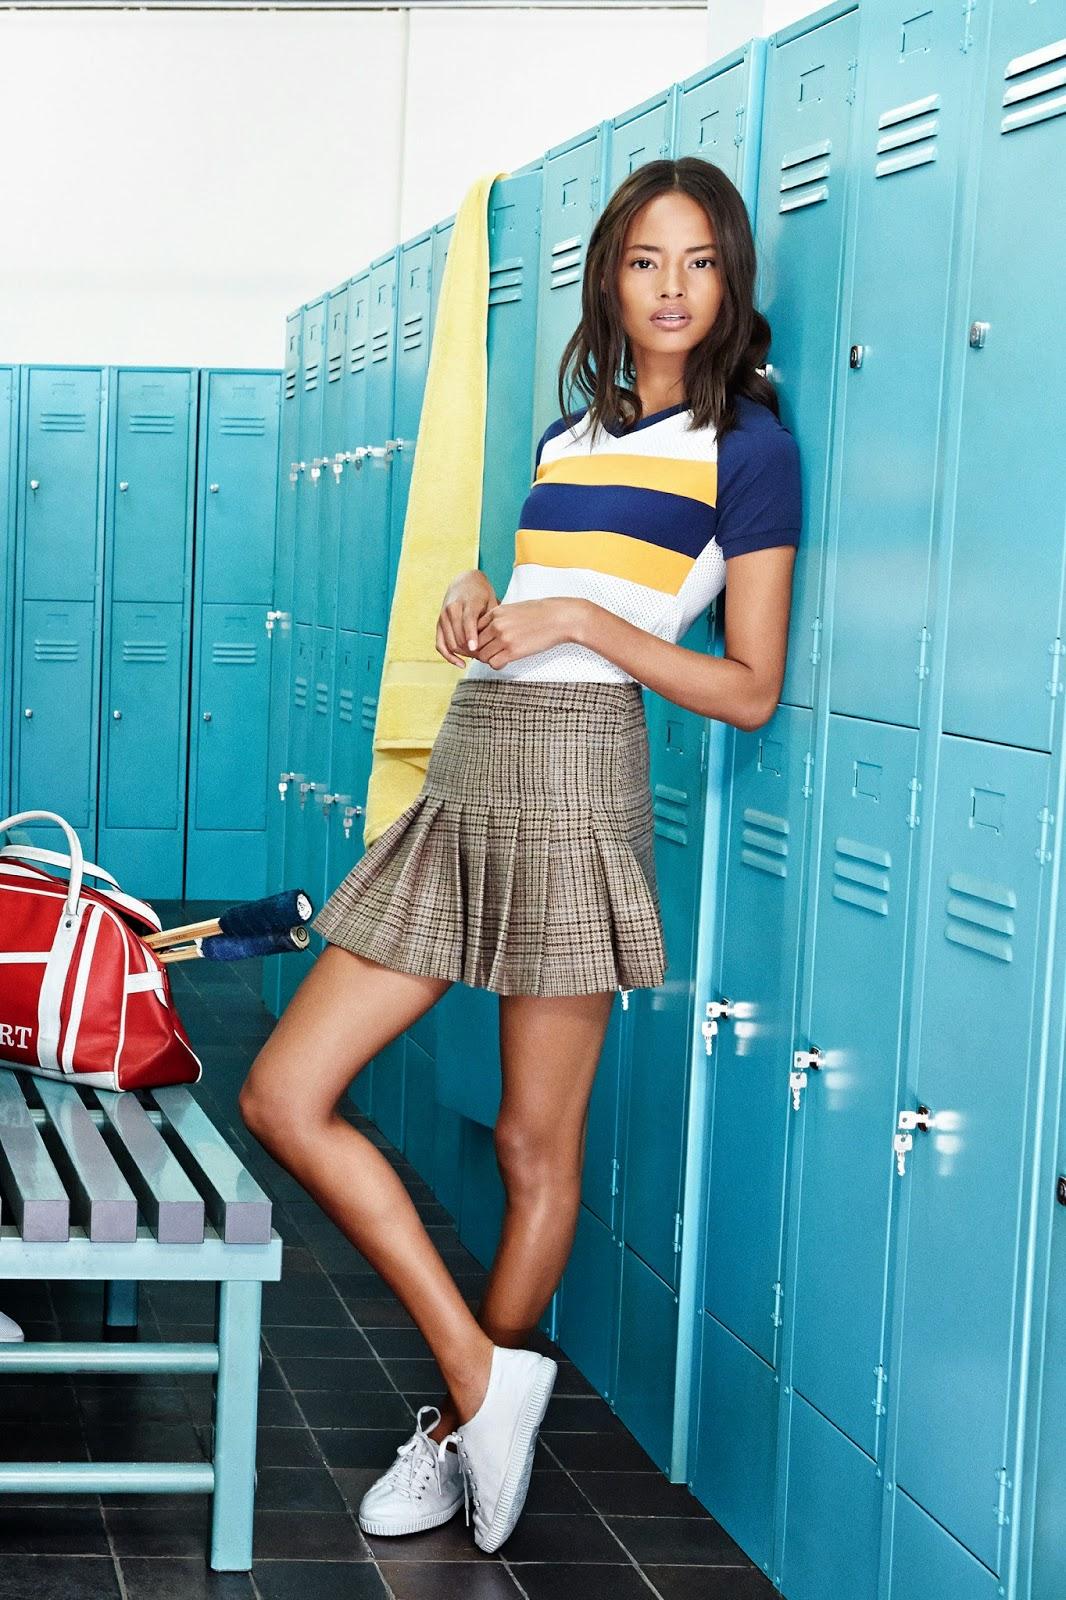 Campaña AW14/15 Zara Trafa, Sporty chic, Street Style, Cool